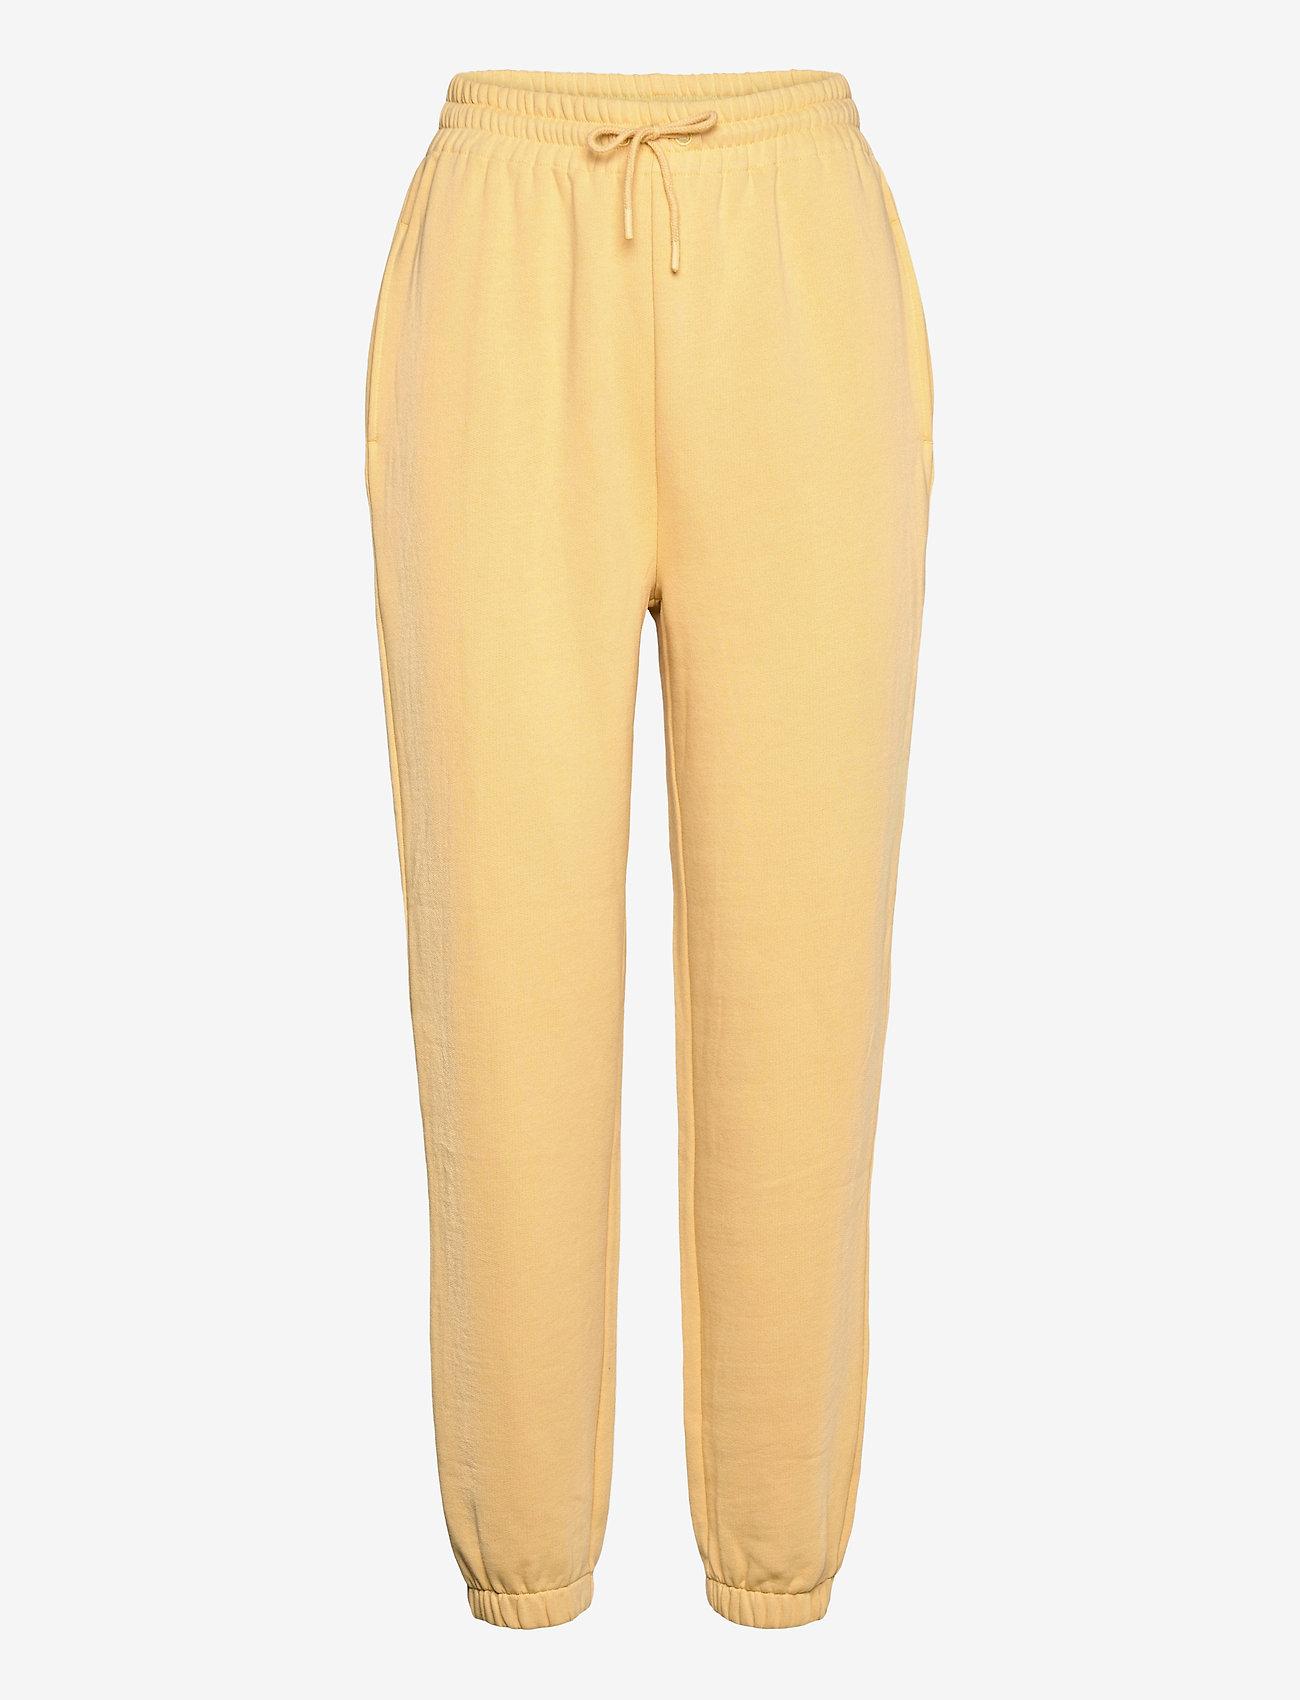 Samsøe Samsøe - Carmen trousers 10902 - sweatpants - sahara sun - 1